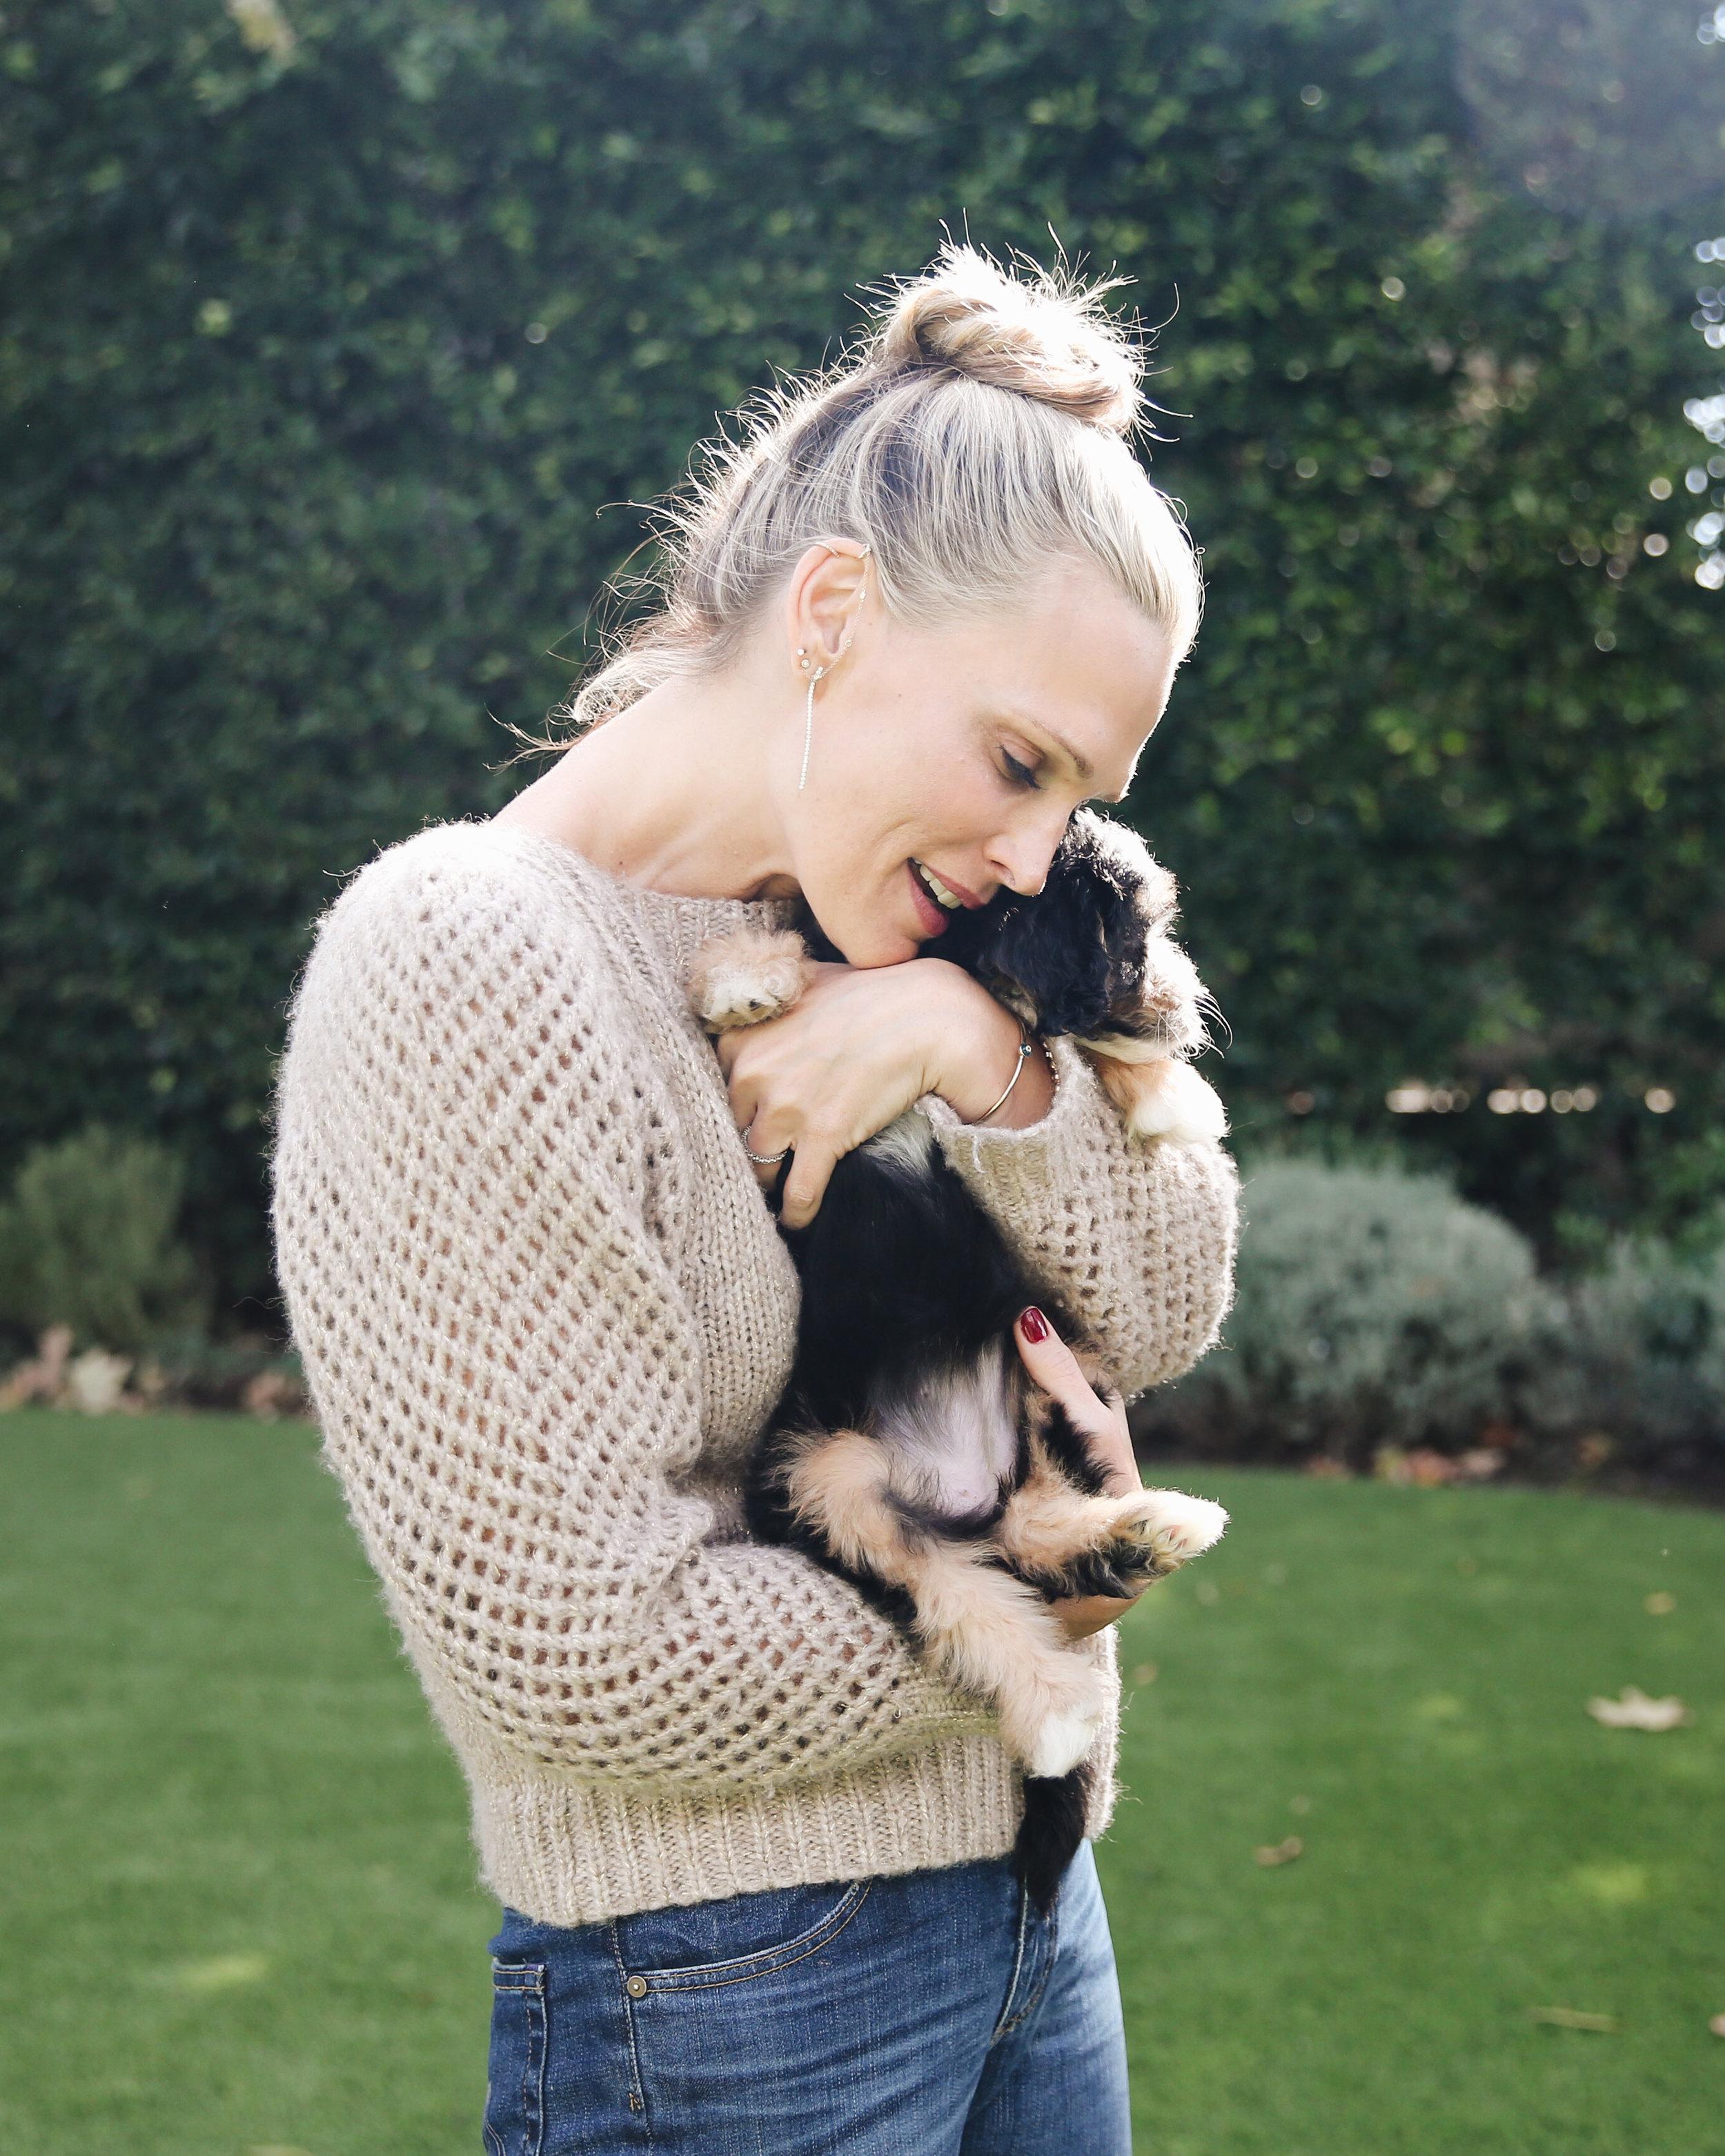 Molly Sims Puppy-28.jpg